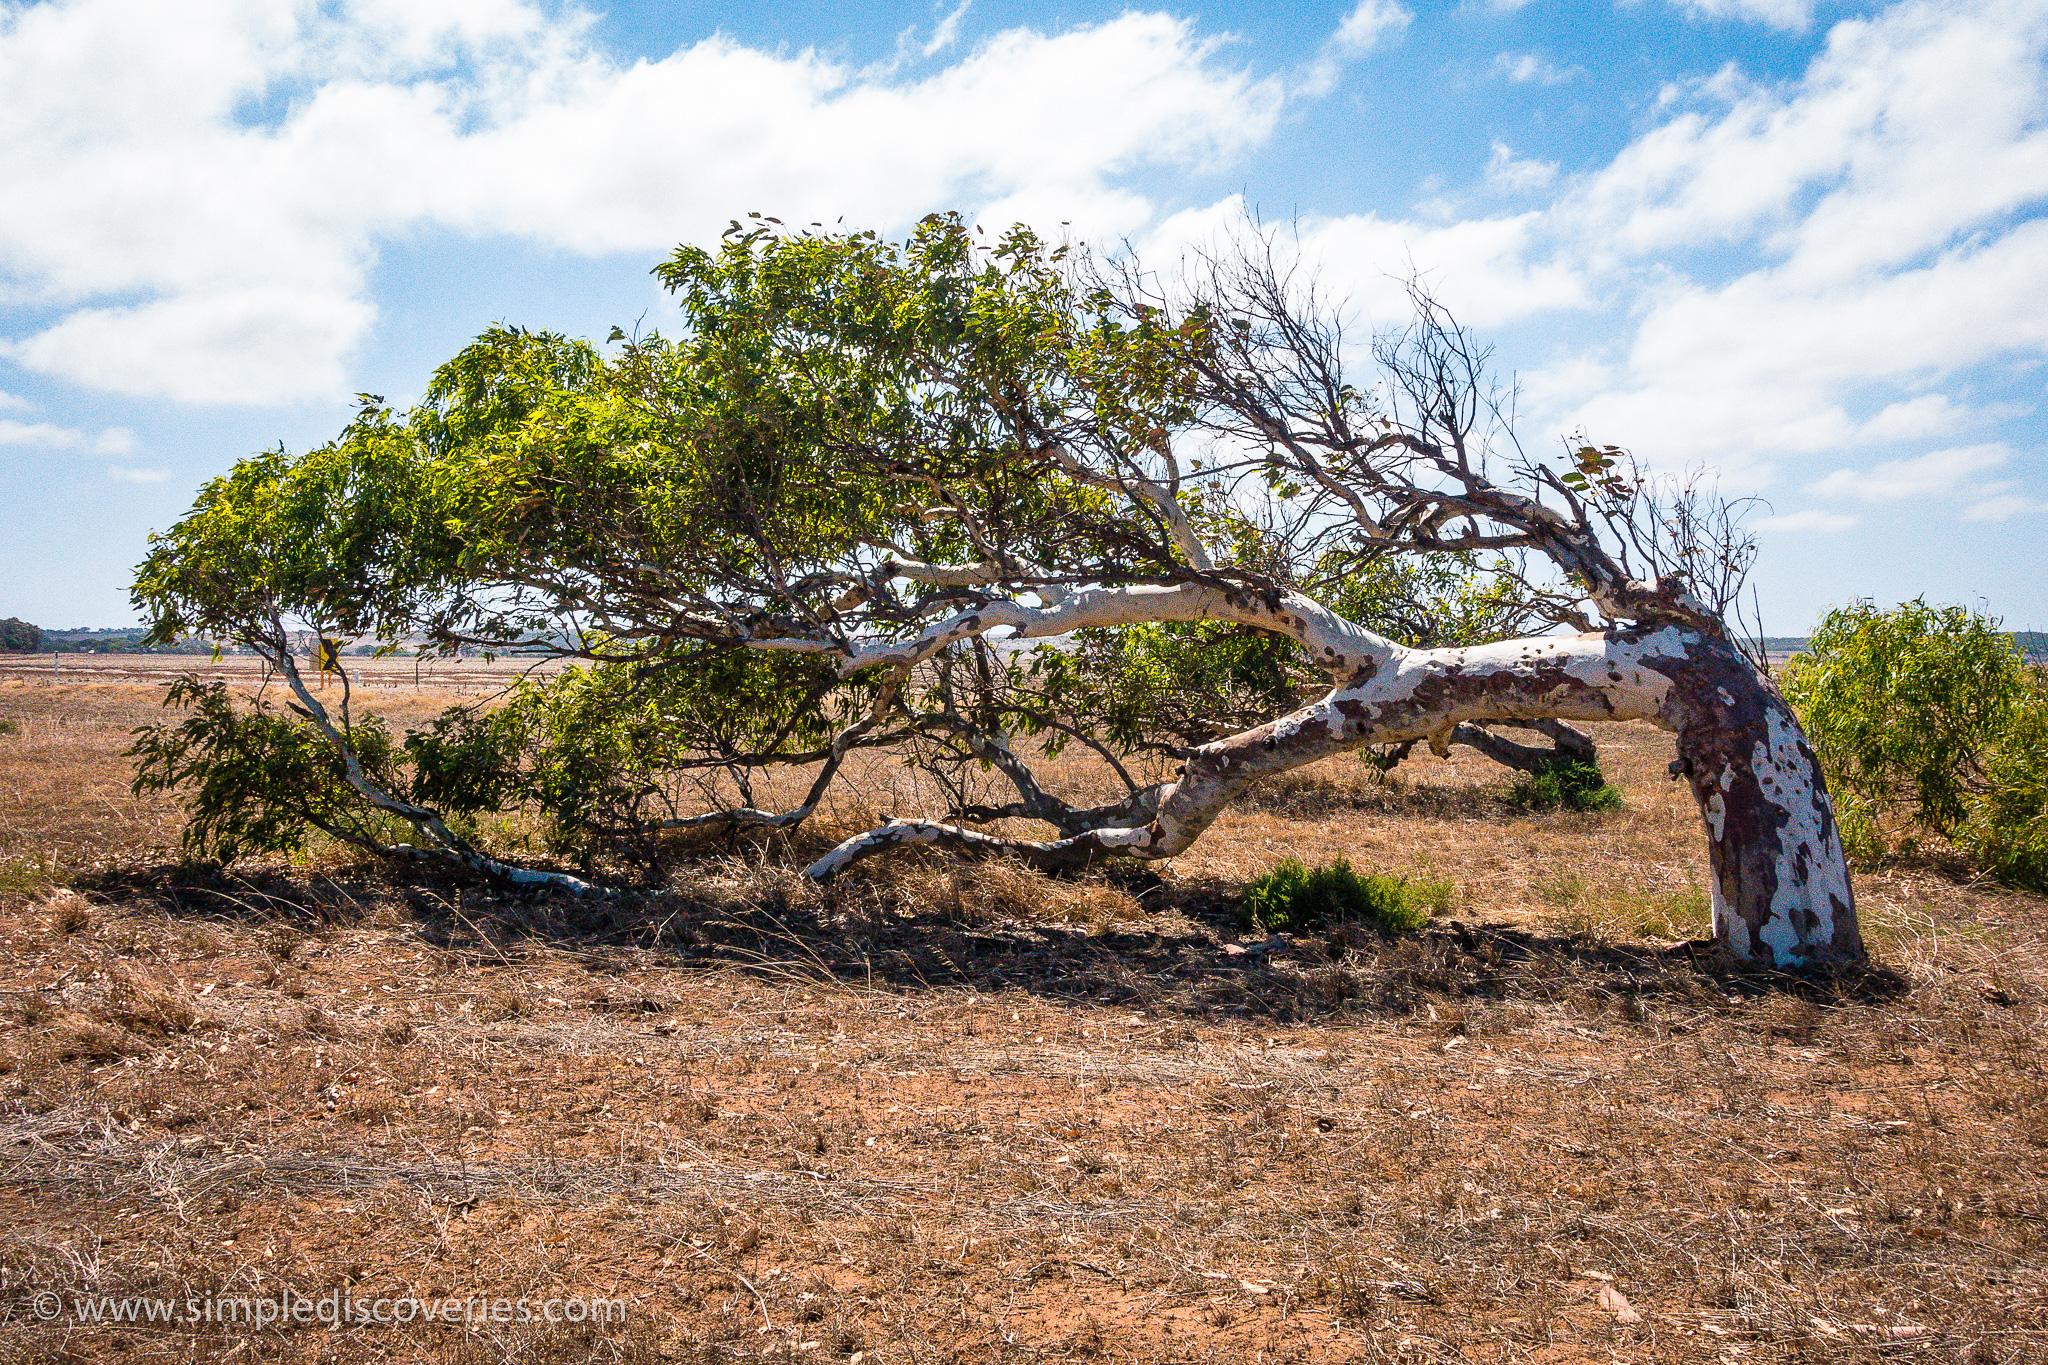 leaning_tree_greenough_australia